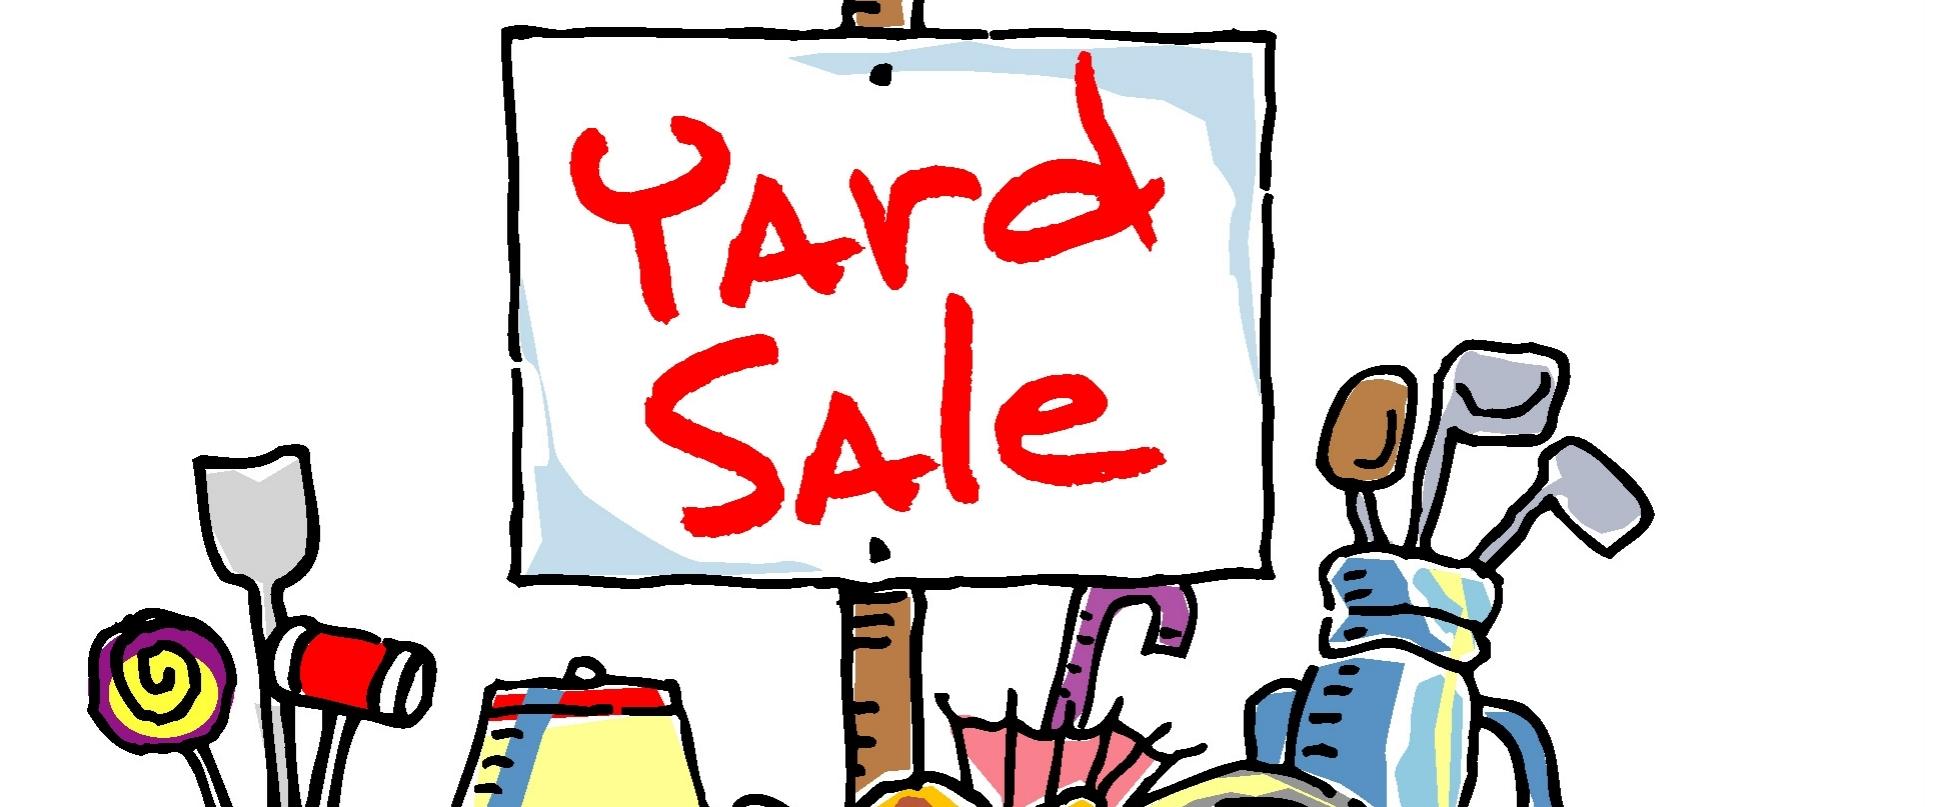 medium resolution of yard sale